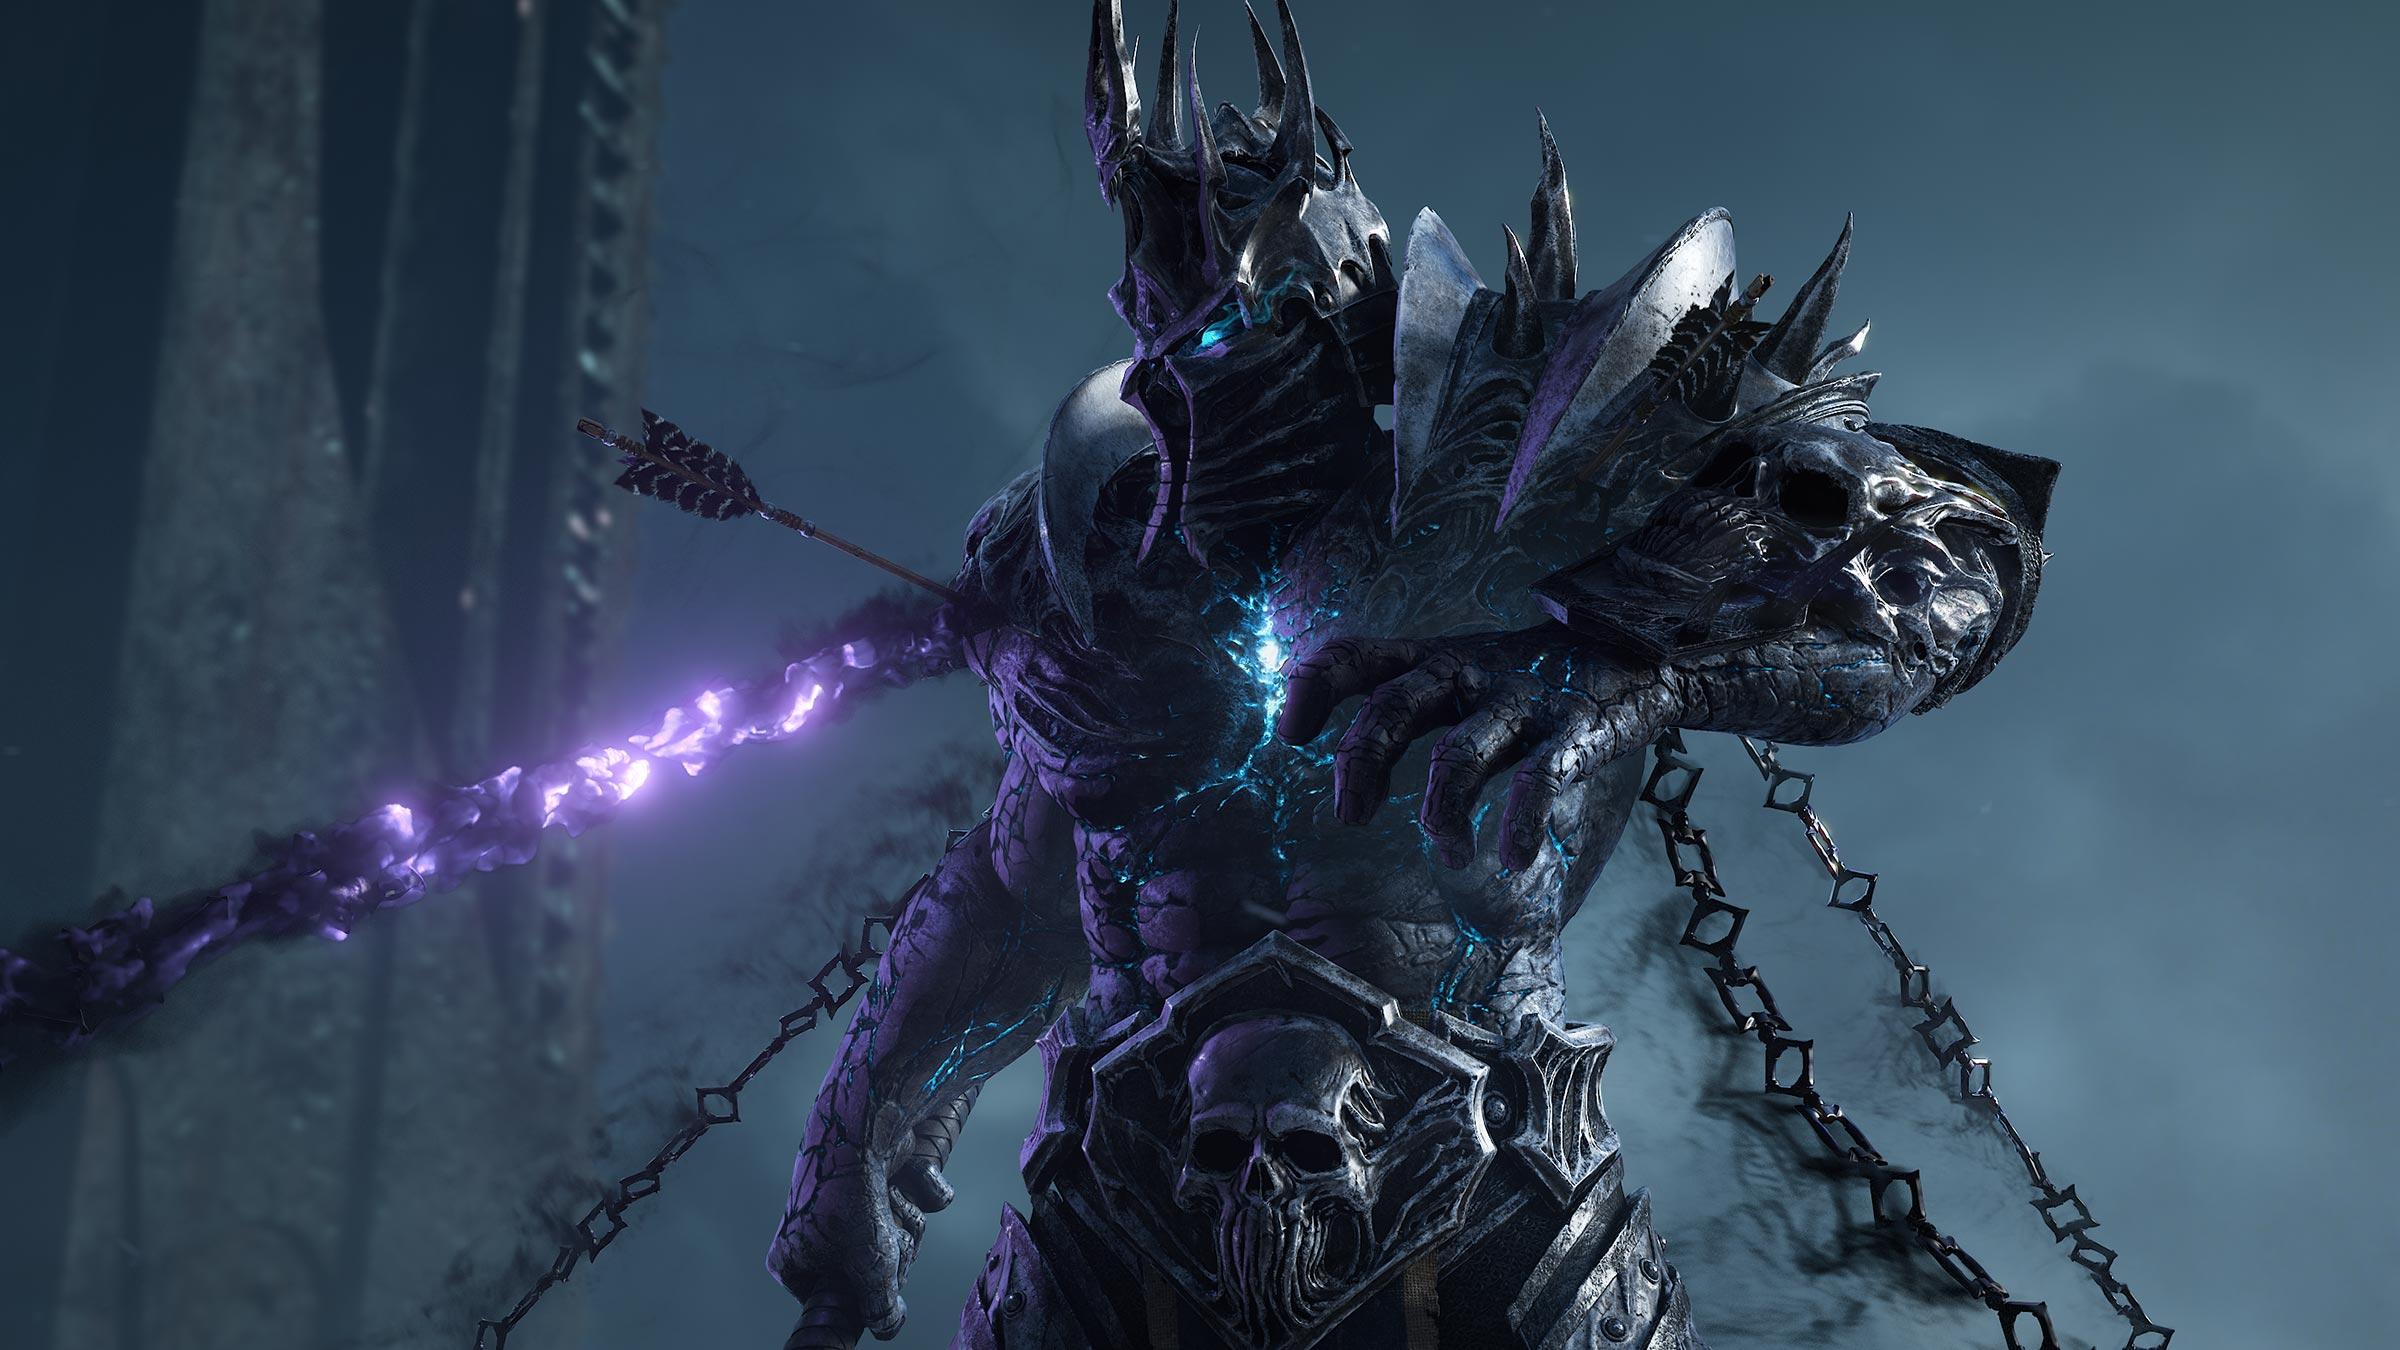 Wallpaper World Of Warcraft Blizzard Entertainment Cg